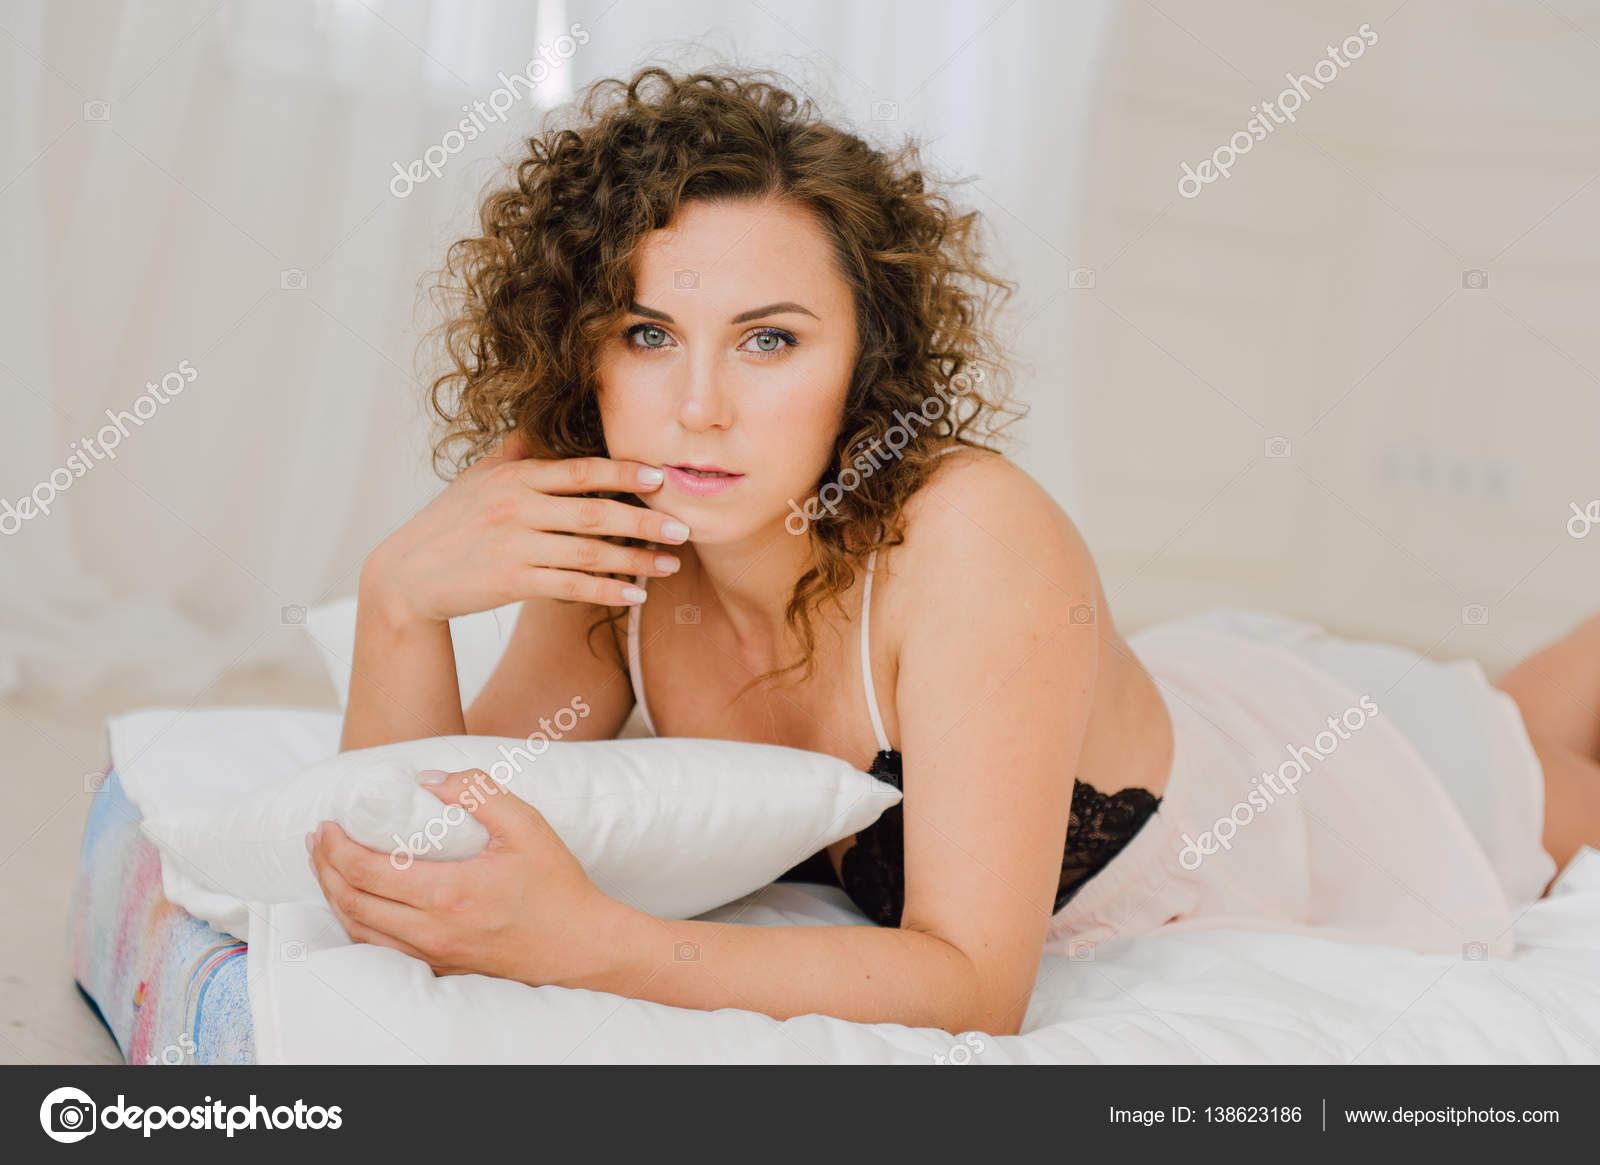 Bybee girls sex videos